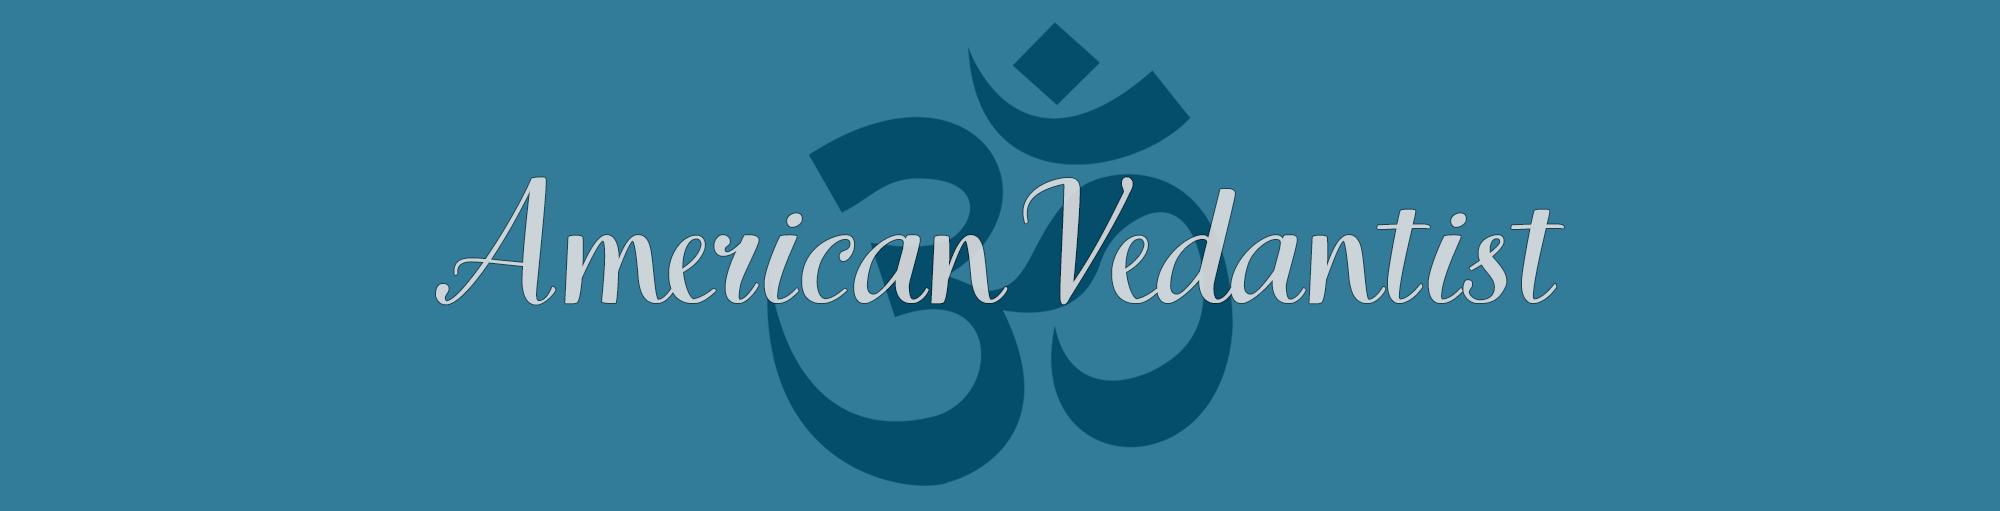 American Vedantist